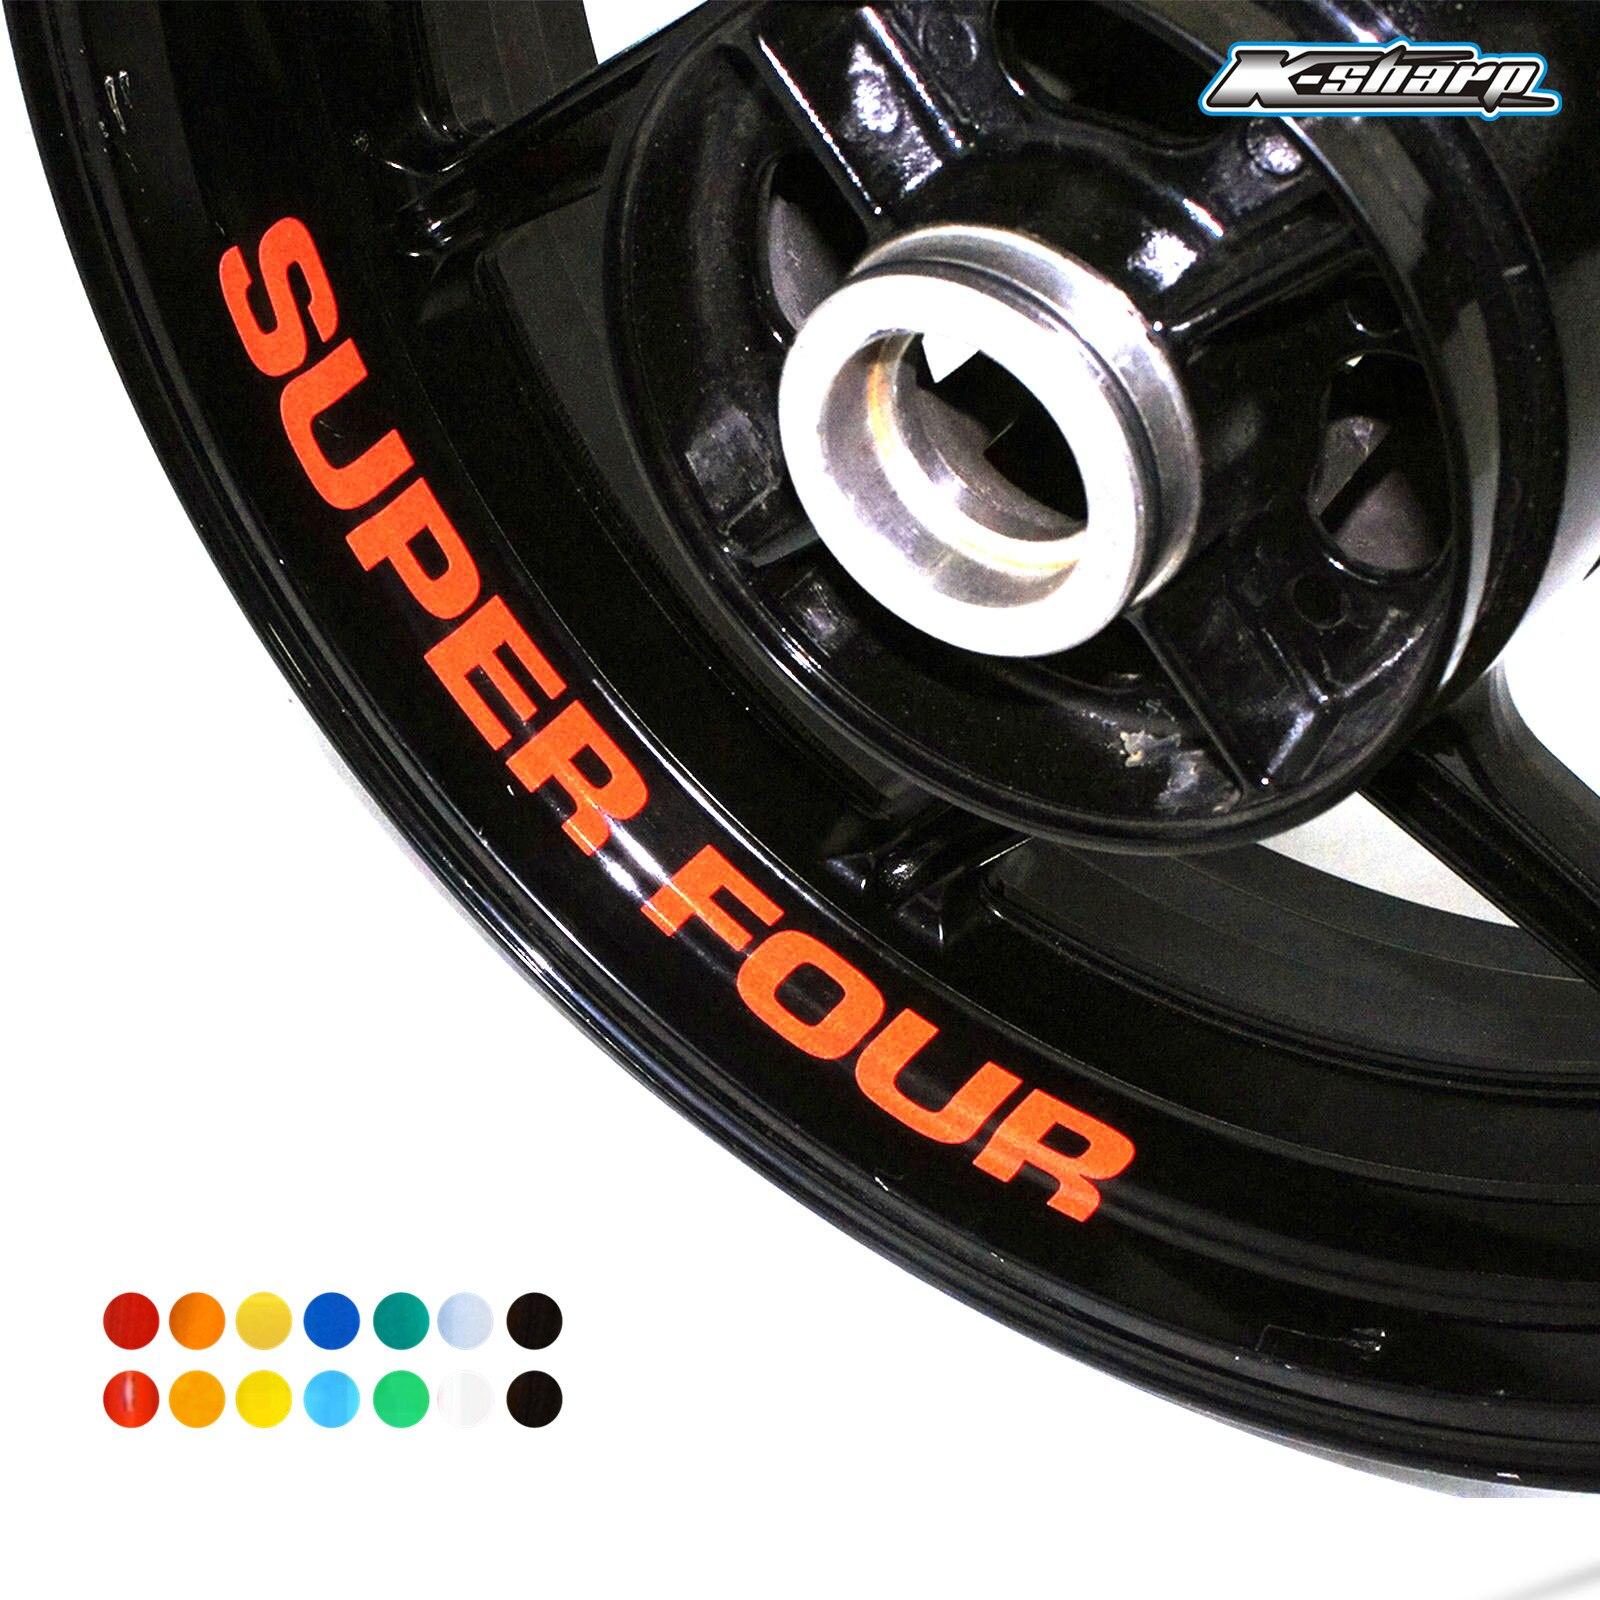 8 X Custon Inner Rim Decals Wheel Reflective Stickers Stripes FIT HONDA SUPER FOUR